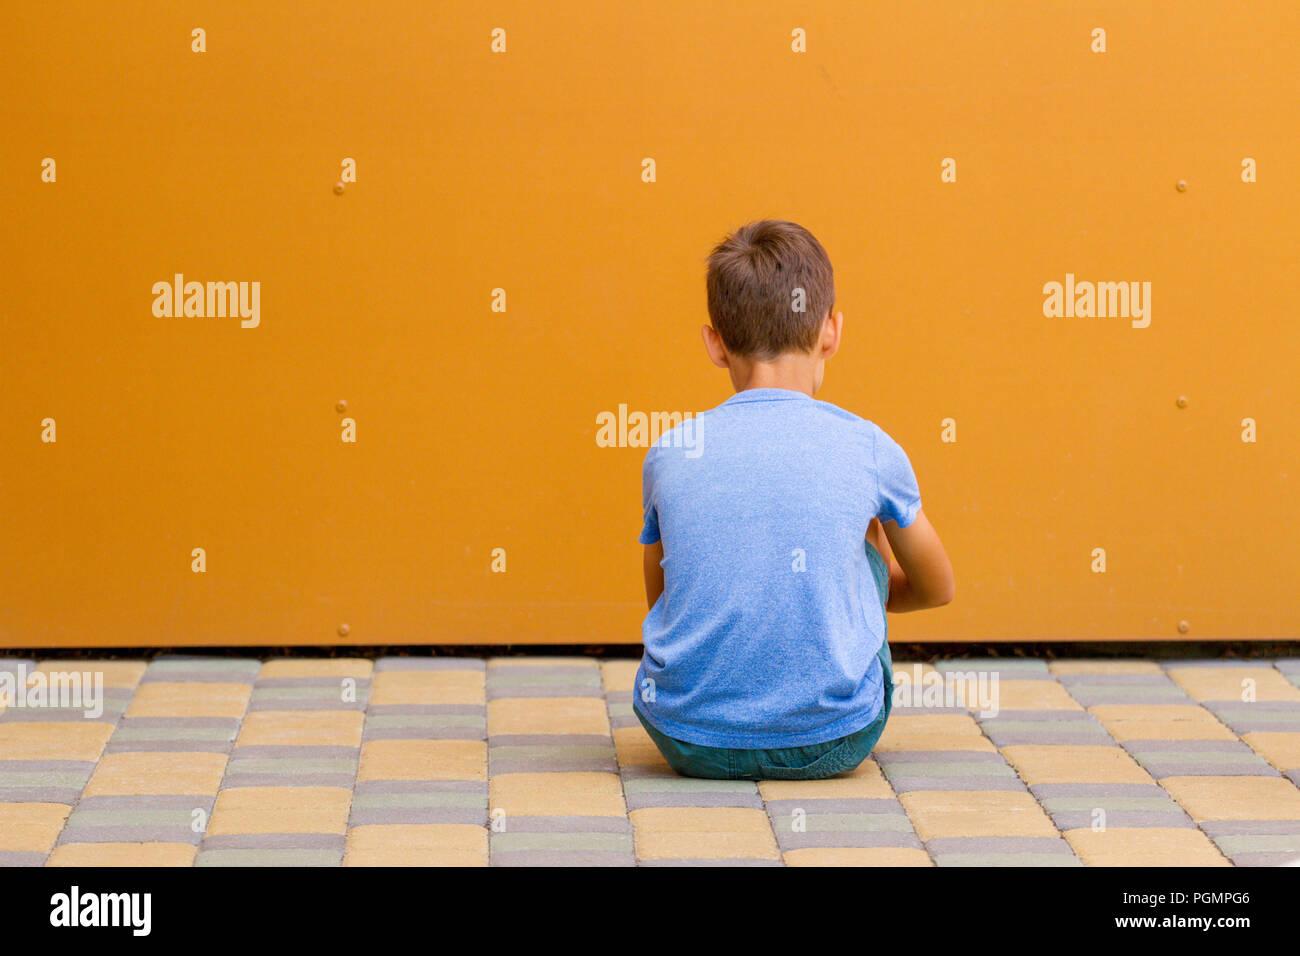 sad alone boy sitting near colorful wall outdoors stock photo